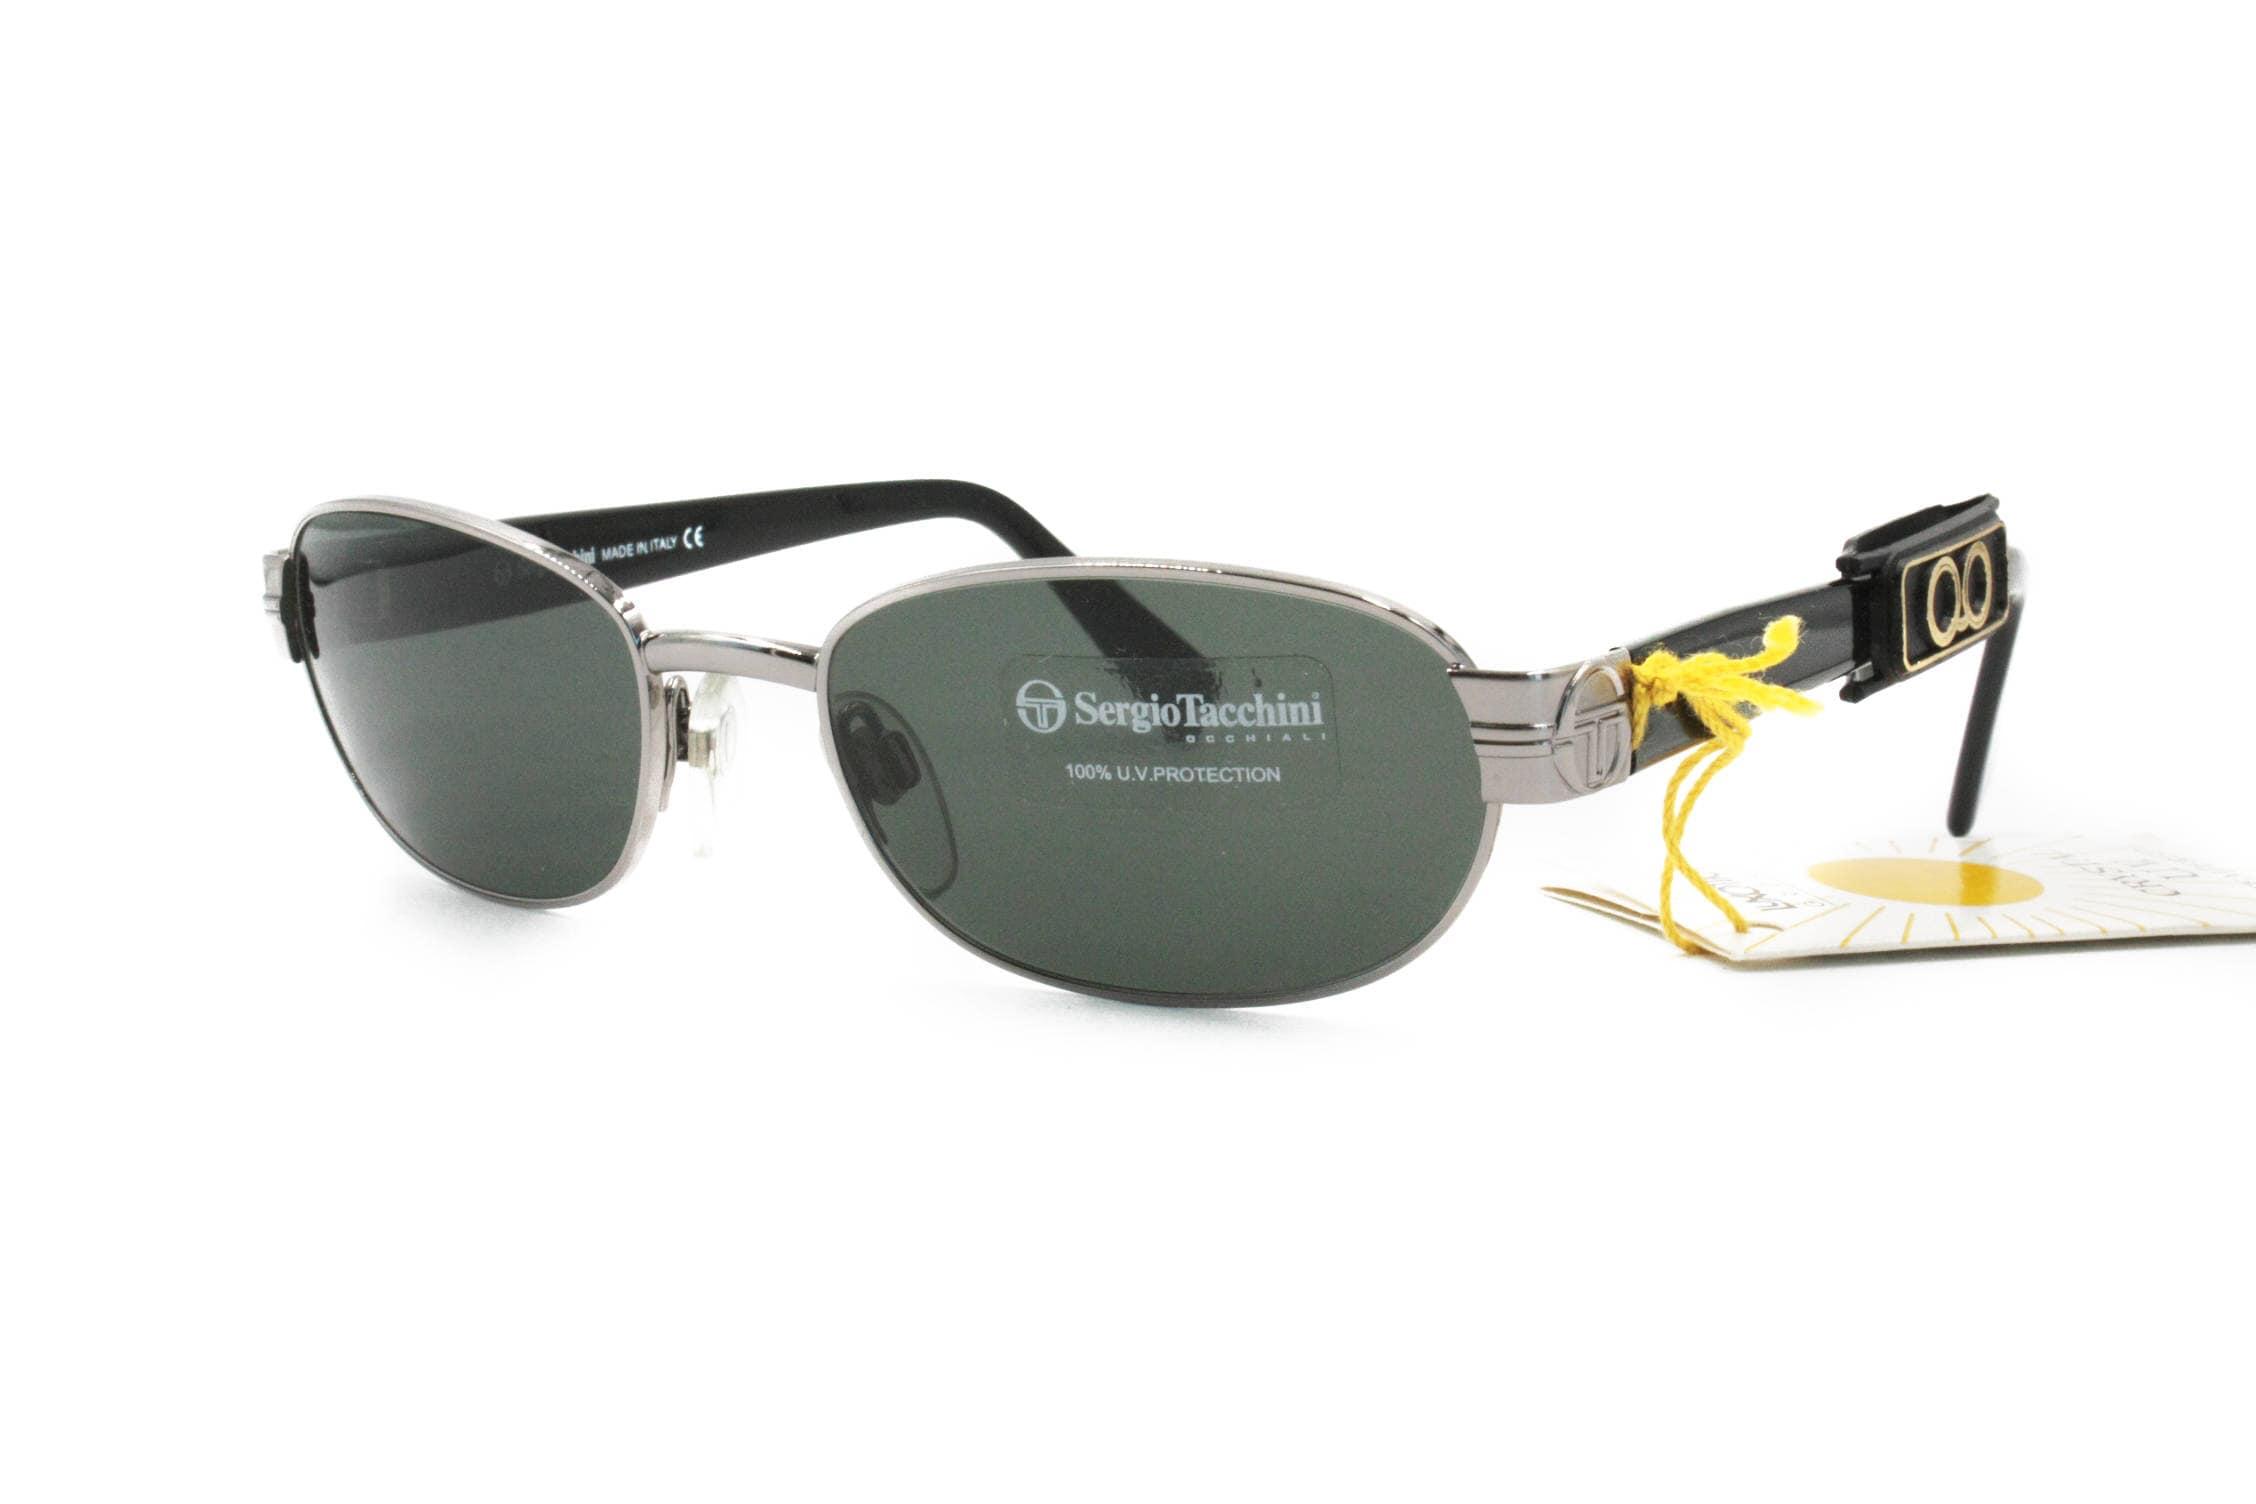 43727b9dcc85 Sergio Tacchini deadstock sunglasses oval-rectangular front